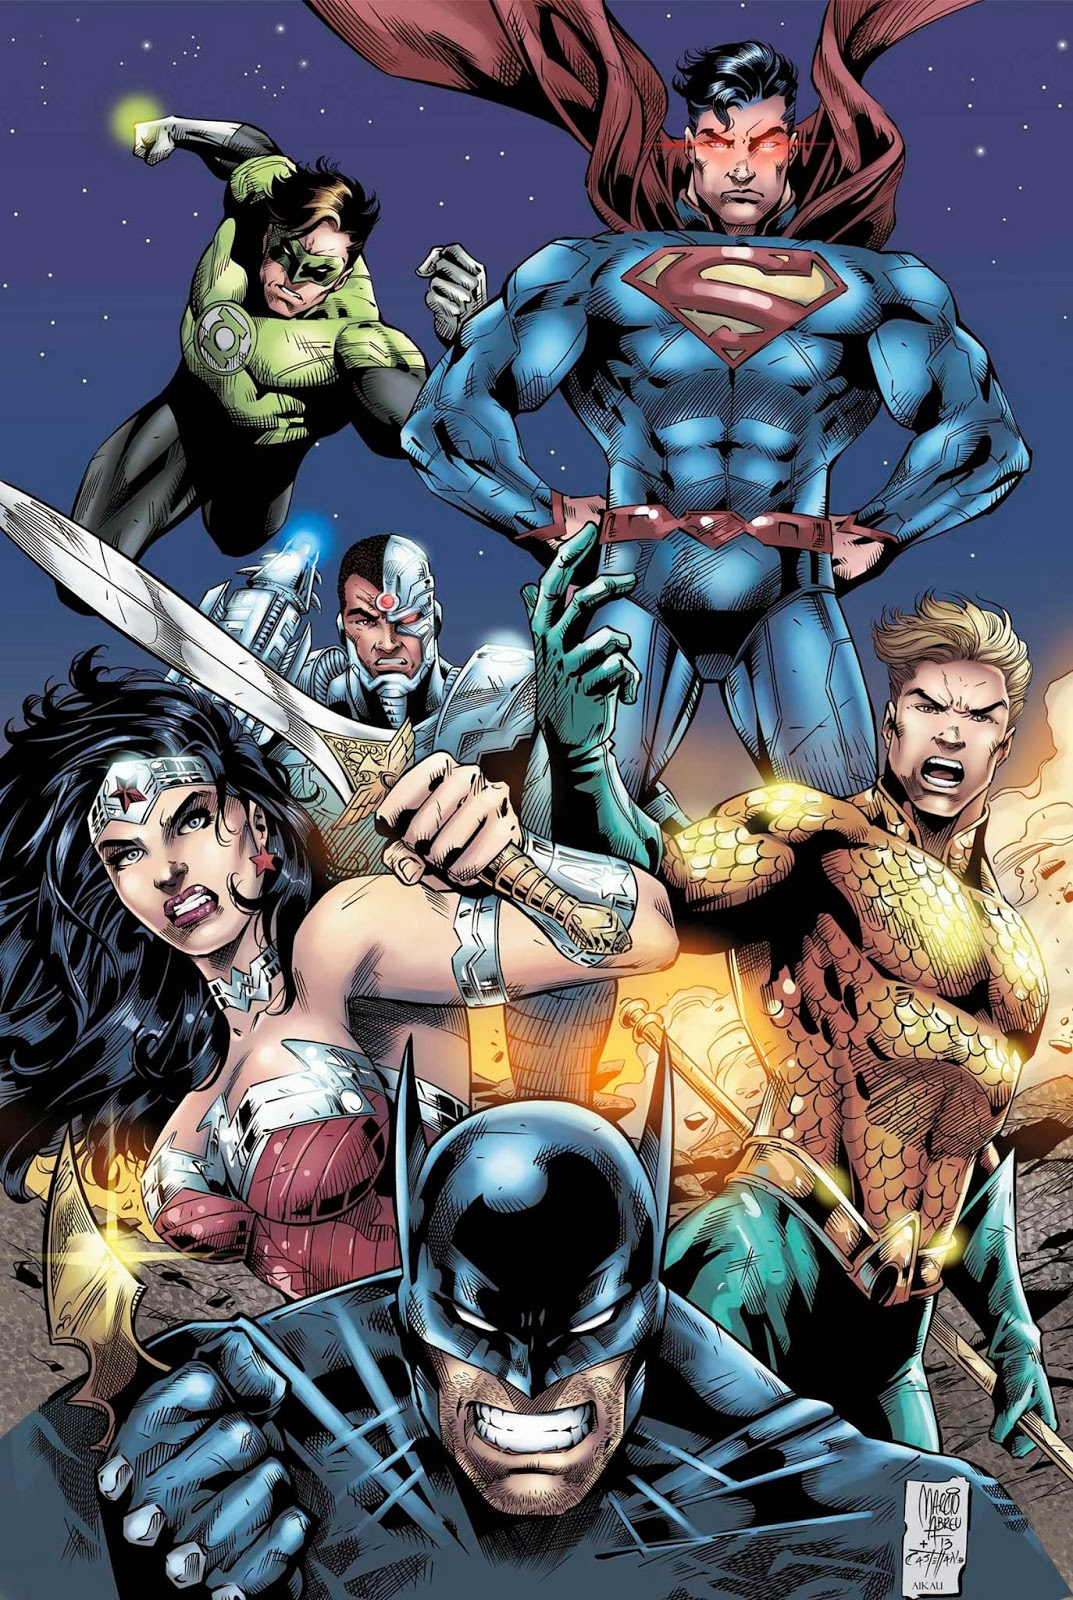 Justice League -Desenho (Pencil): Marcio Abreu - Arte-final (Ink): John Castelhano - Cores (Color): Aikau de Oliveira